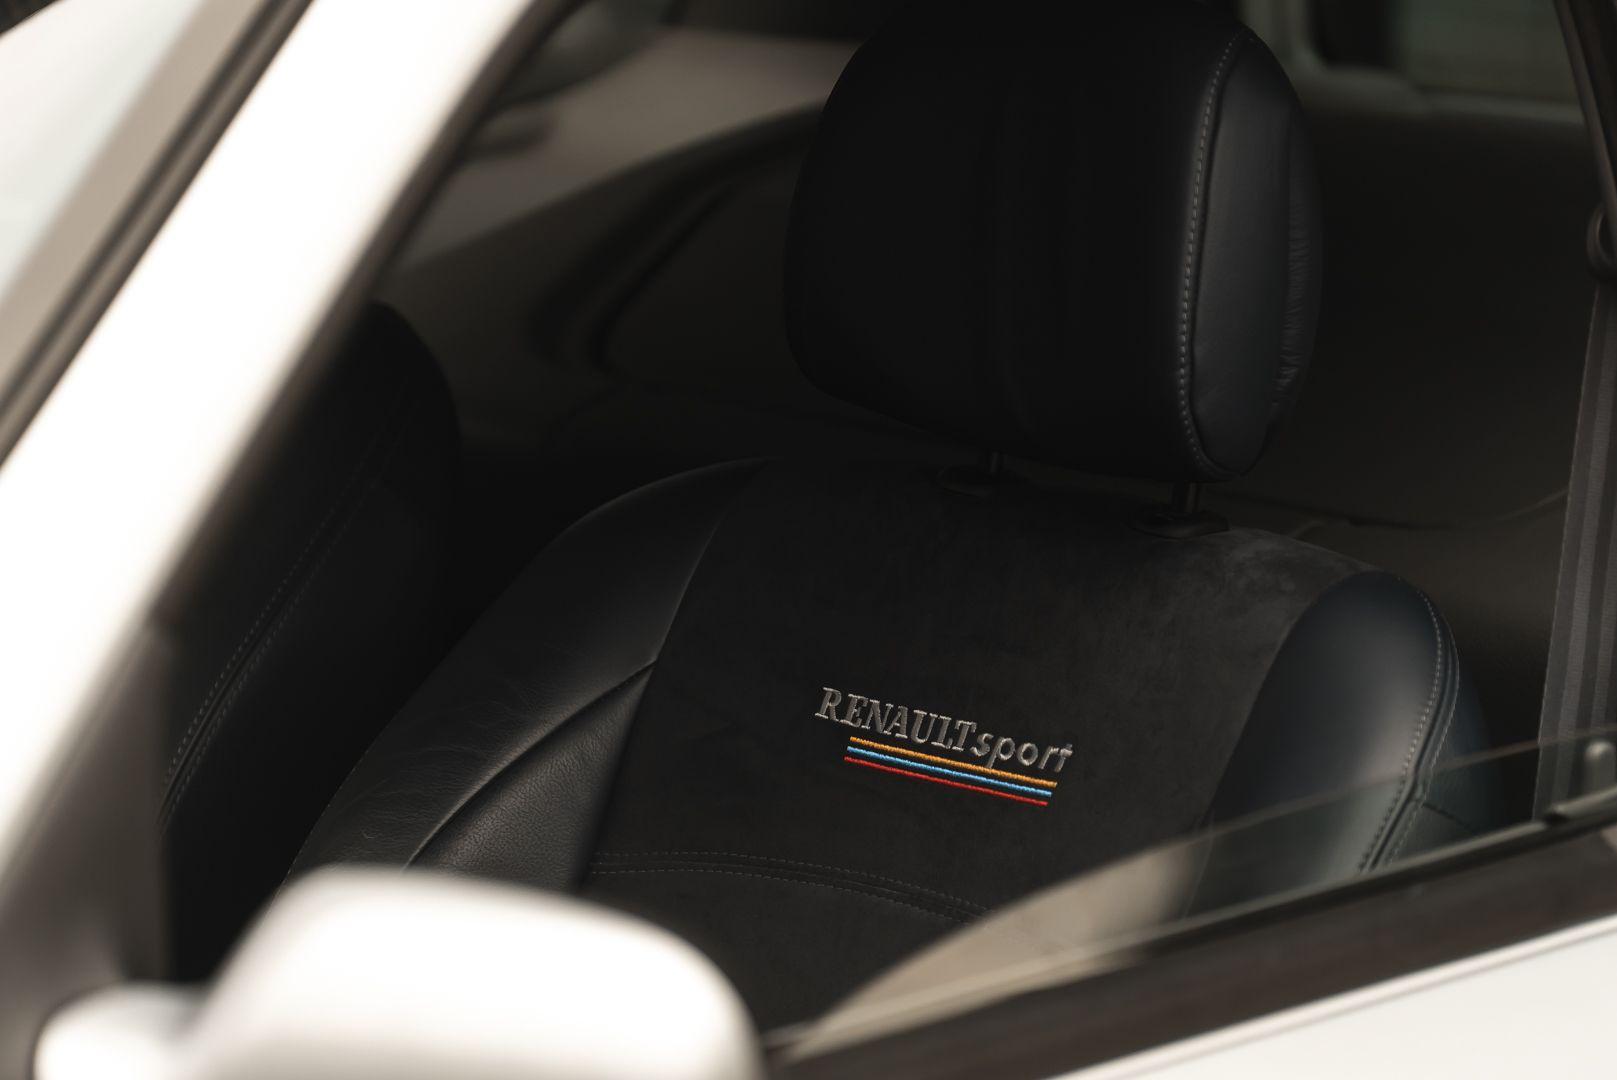 2002 Renault Clio 3.0 V6 Renault Sport Phase1 84945